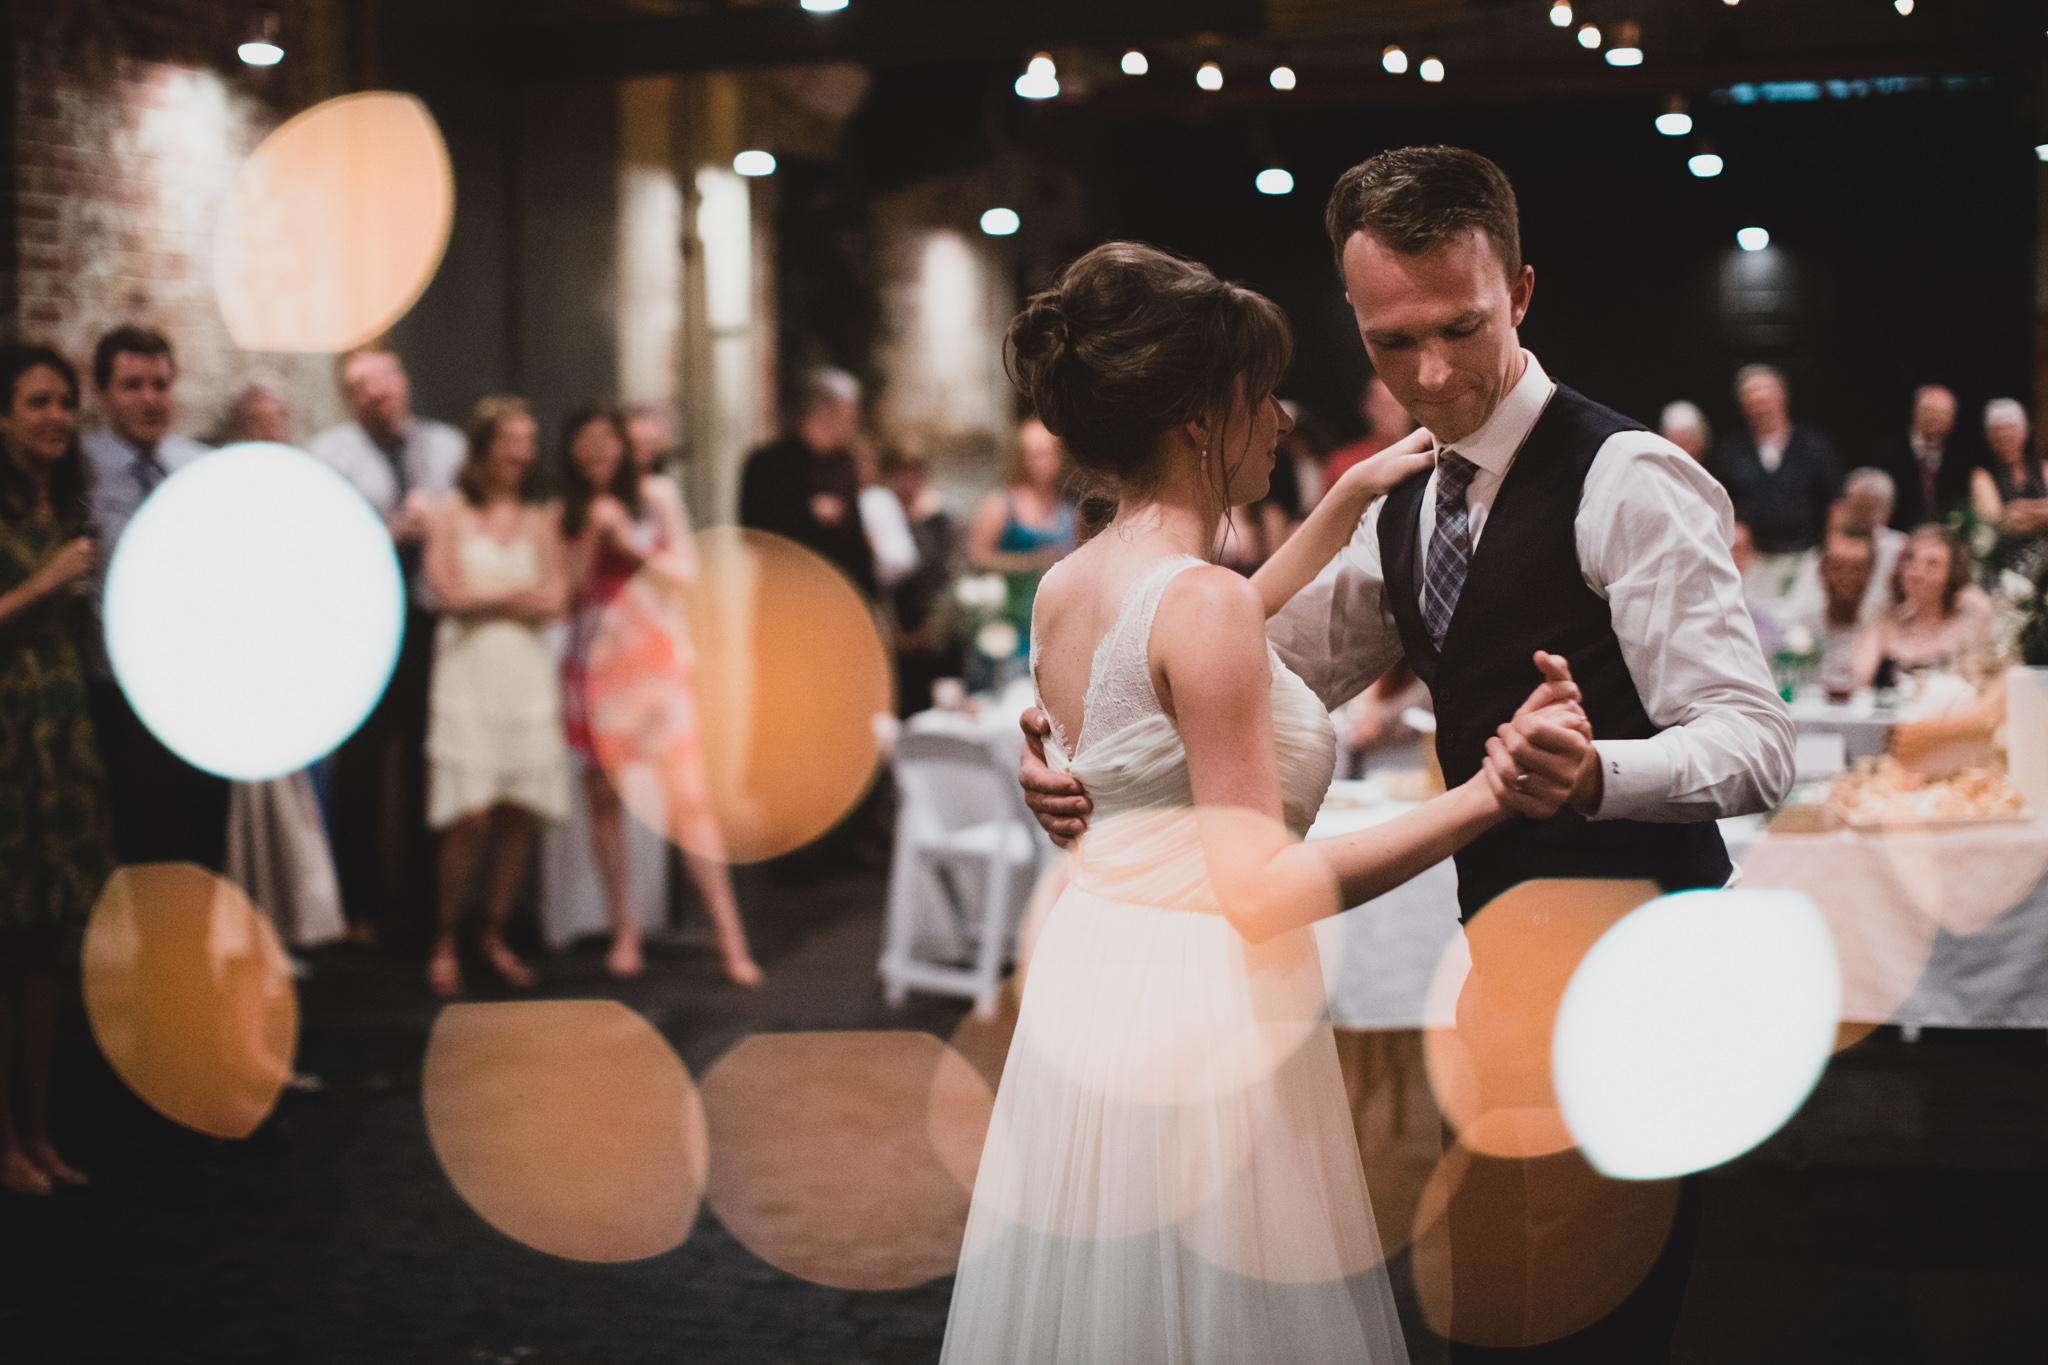 Artistic Wedding Photo in Ontario